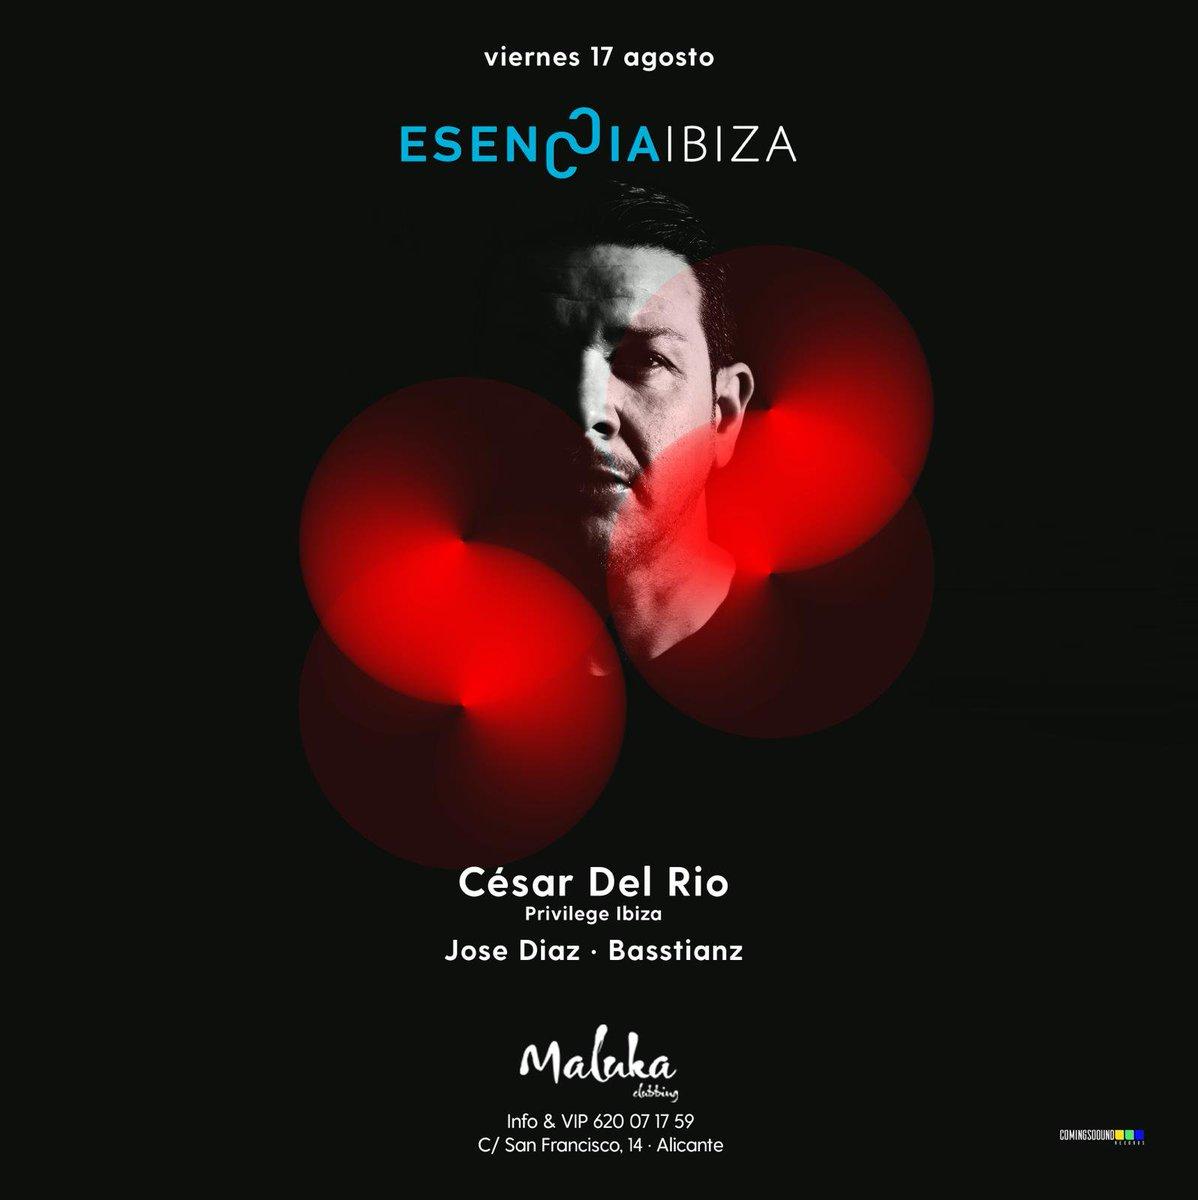 Can't wait for tomorrow #EsencciaIbiza at Maluka Club #Alicante   #Tour2018 #party #partytime #dance #music #friends #privilege #esenccia #Ibiza #electronicmusic #Techno #techhouse #underground #undergroundartist #tickets #TICKET    http:// bit.ly/2w6XiinEsencci aIbizaatMaluka &nbsp; … <br>http://pic.twitter.com/fSPzalsyFb